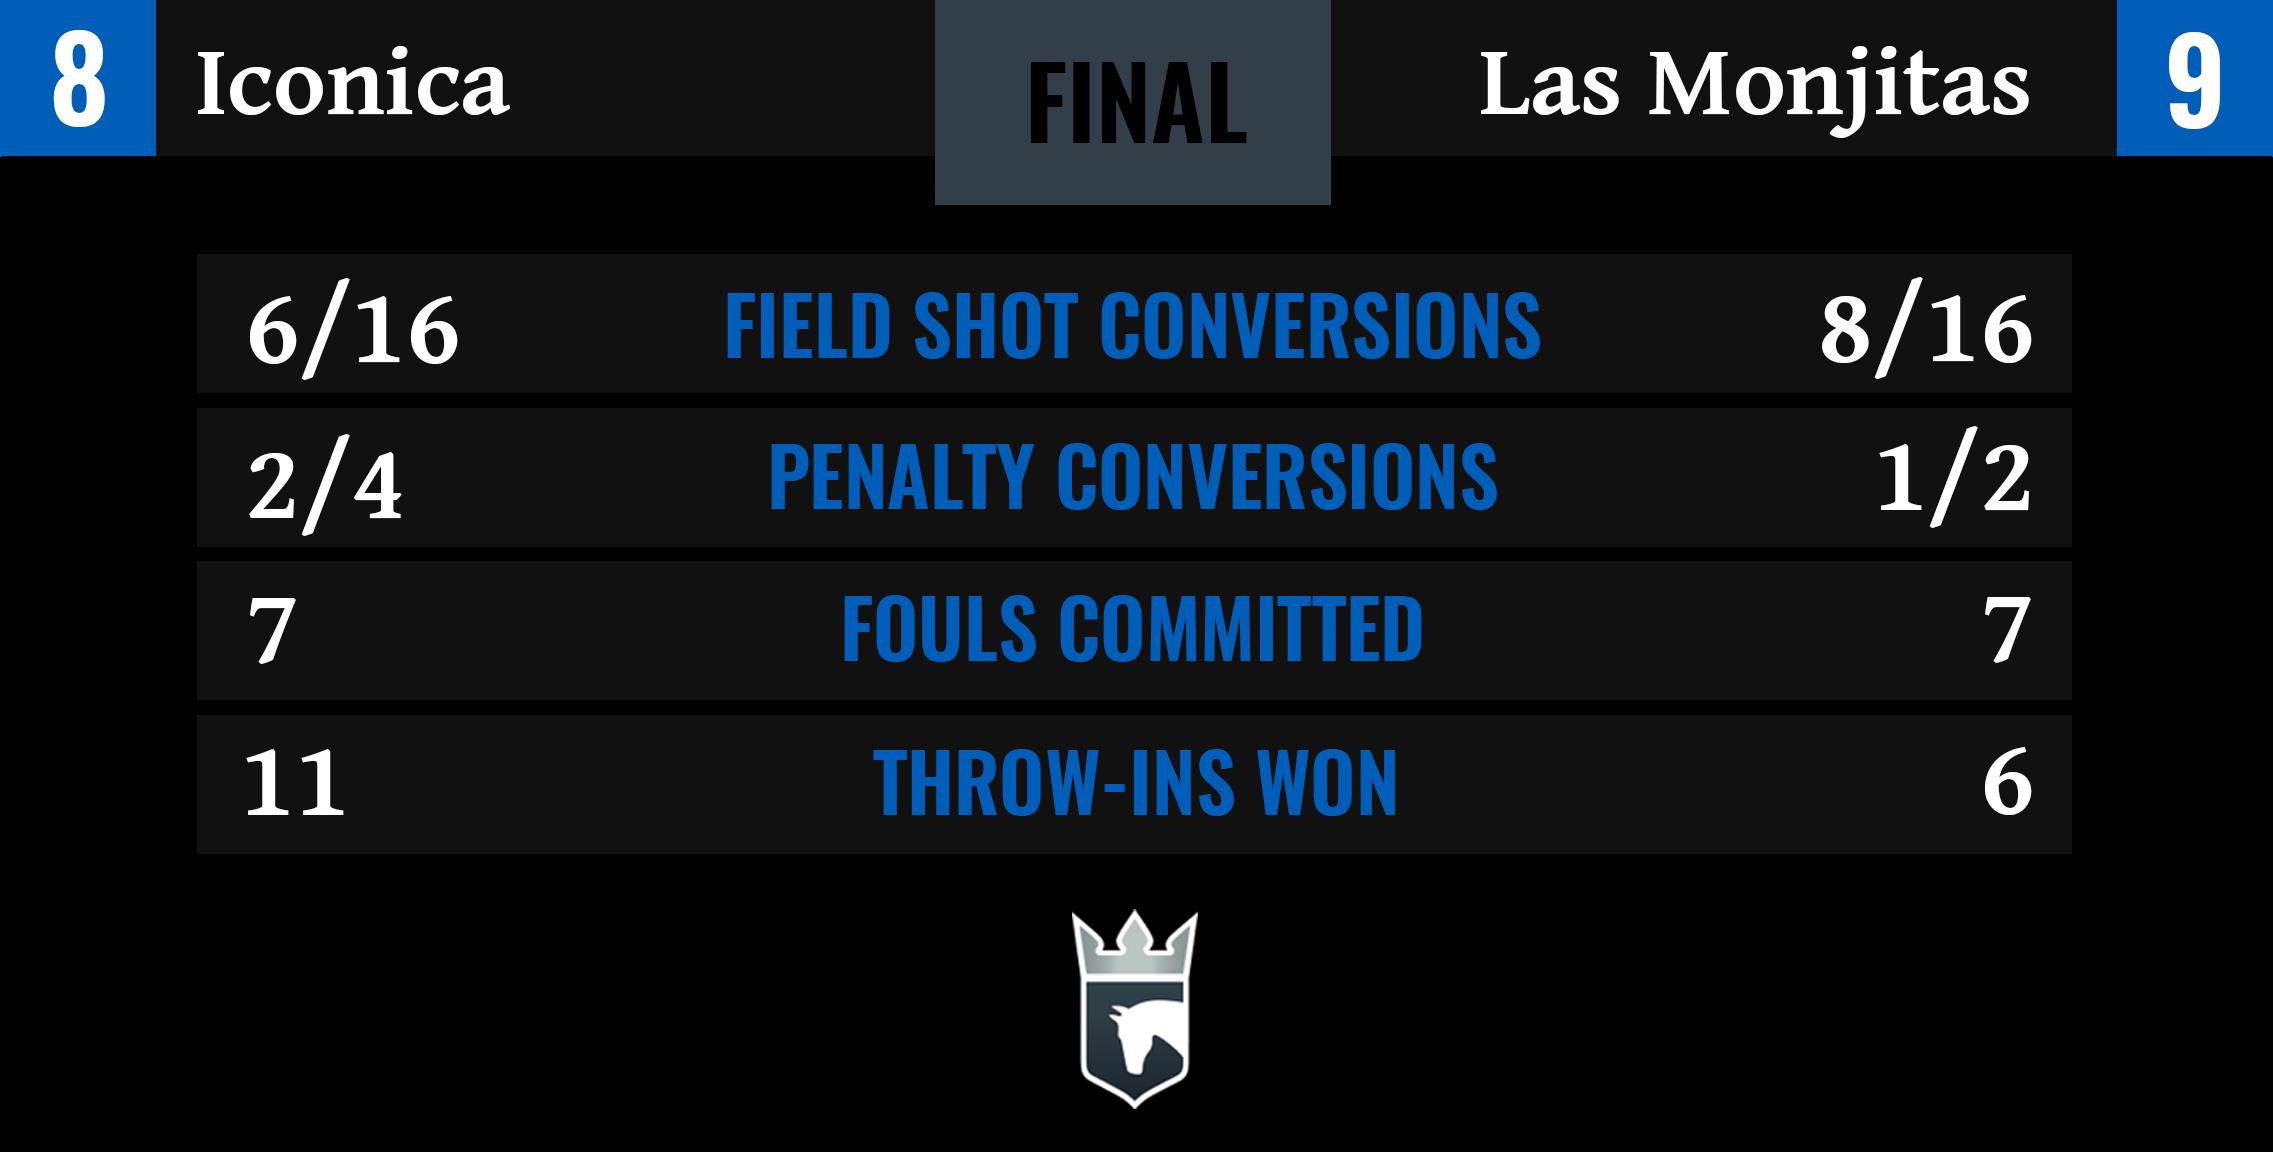 Iconica vs Las Monjitas Final Stats